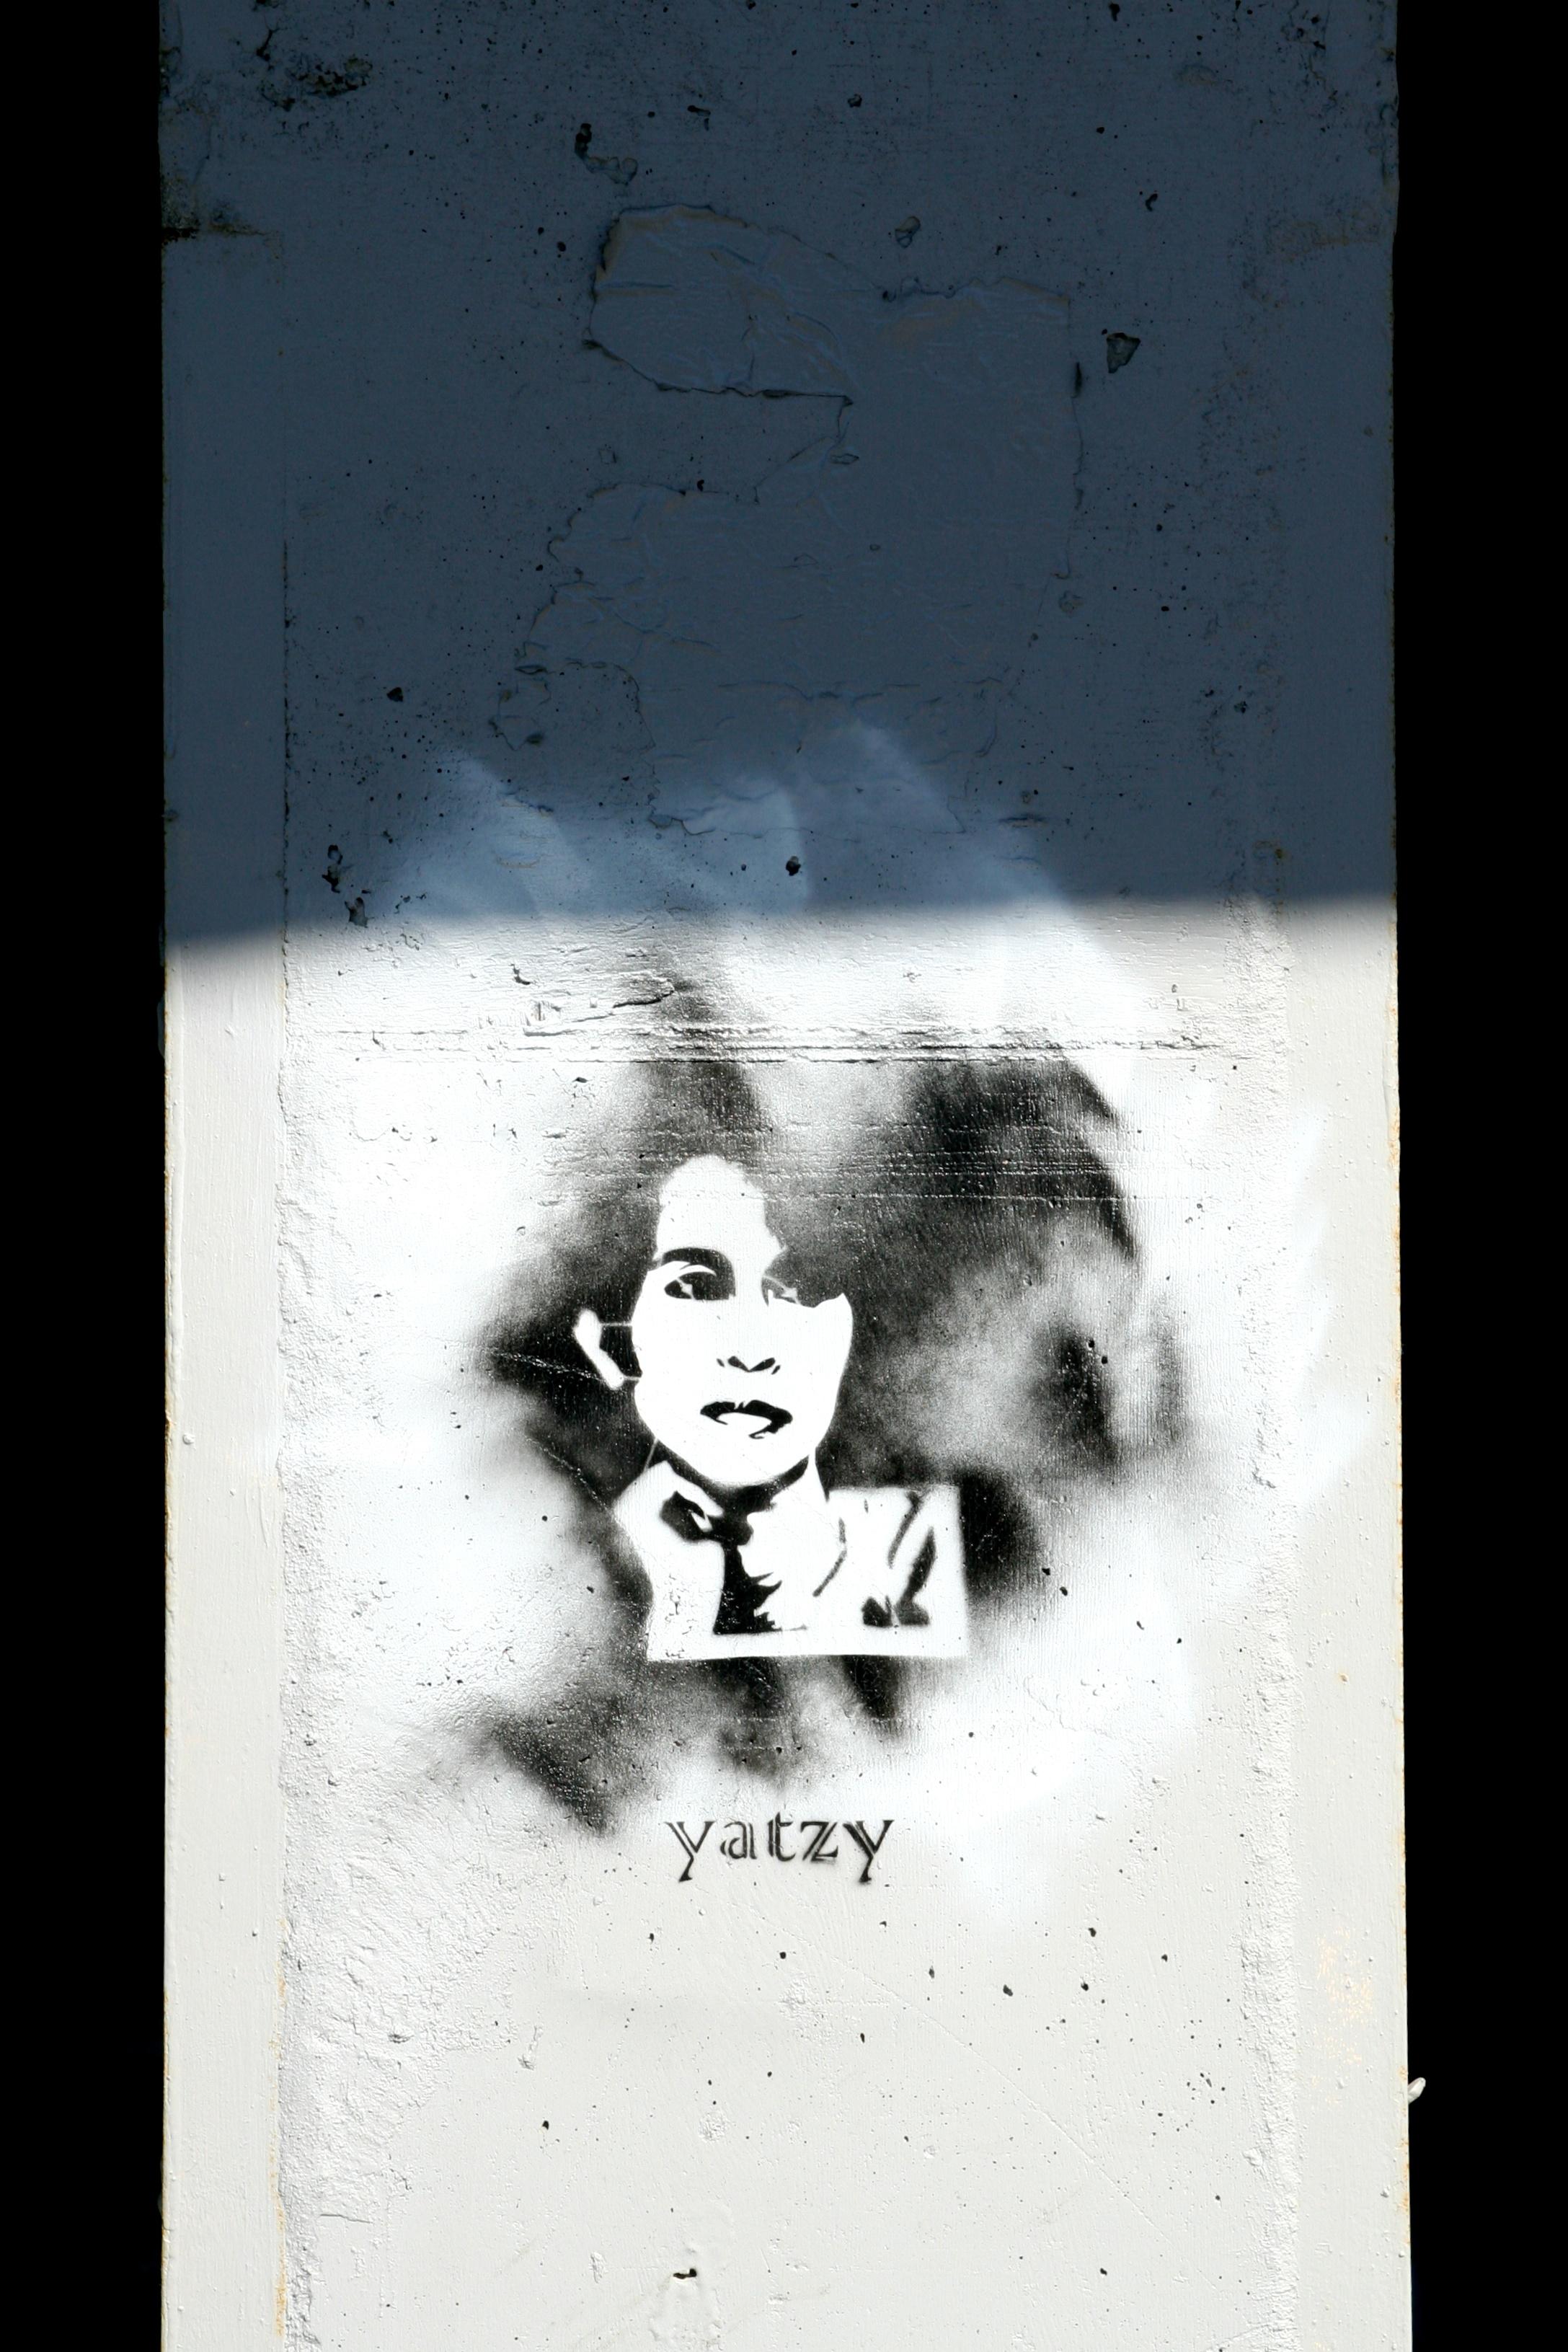 yatzy8.jpg